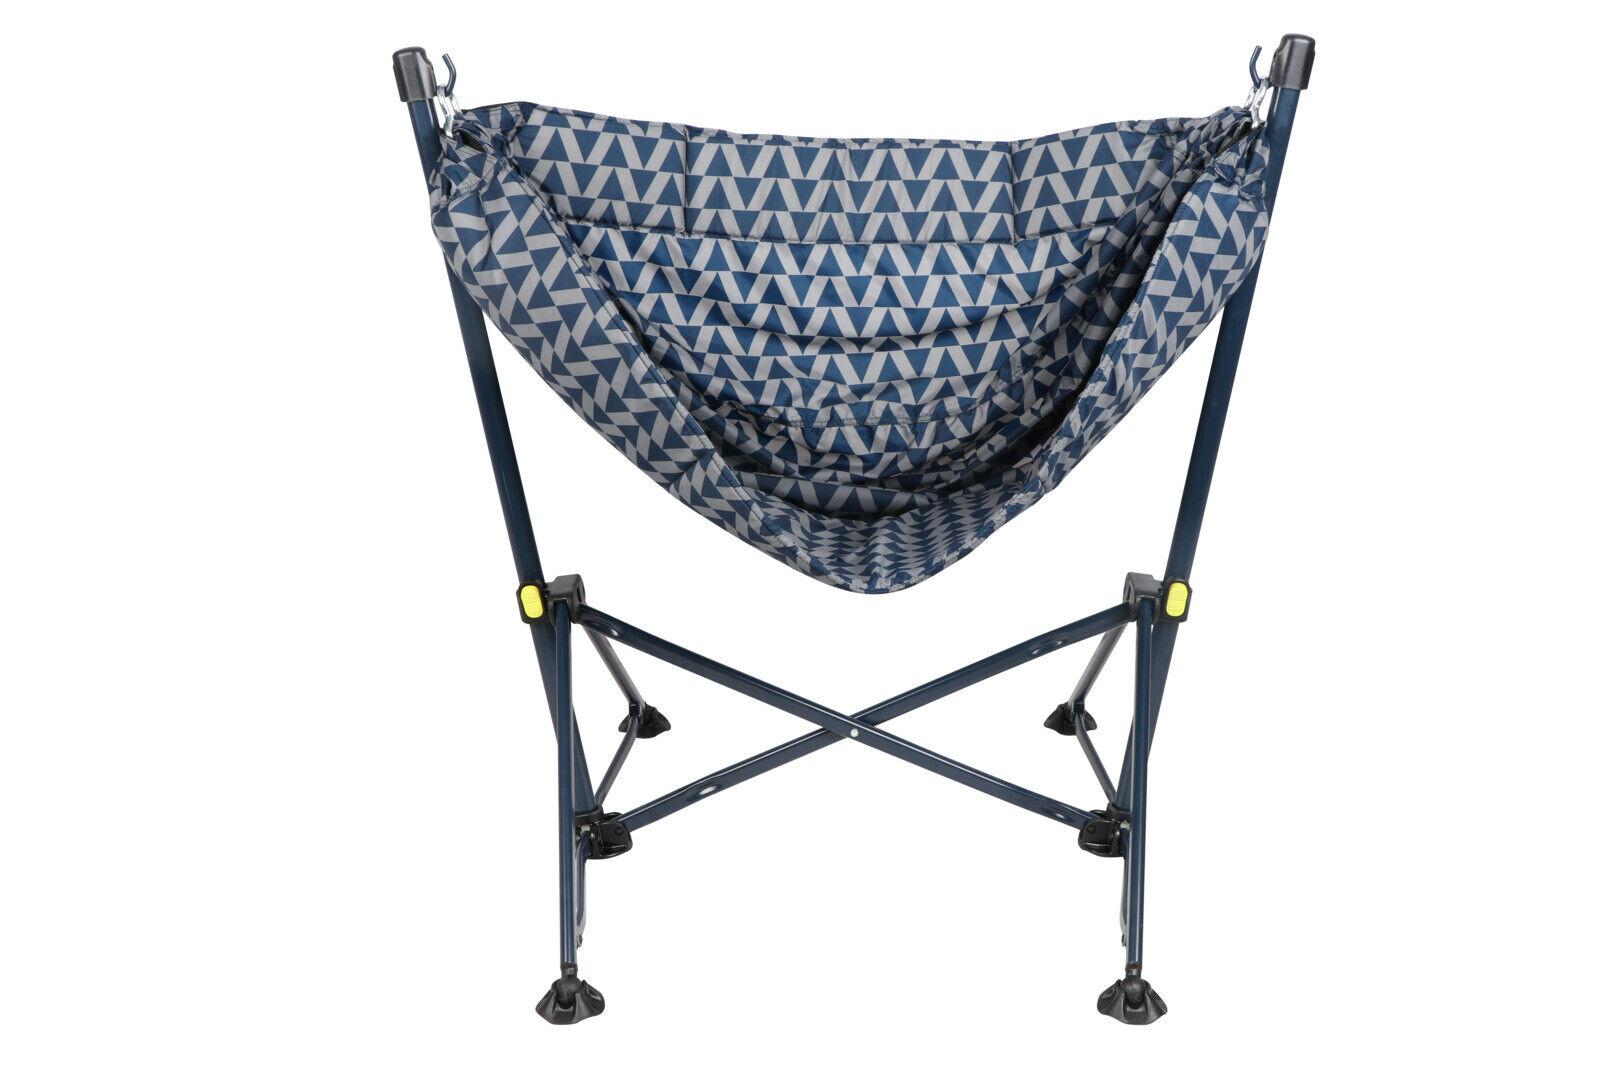 Ozark Trail Steel Folding Hammock Chair With Padded Seat Portable